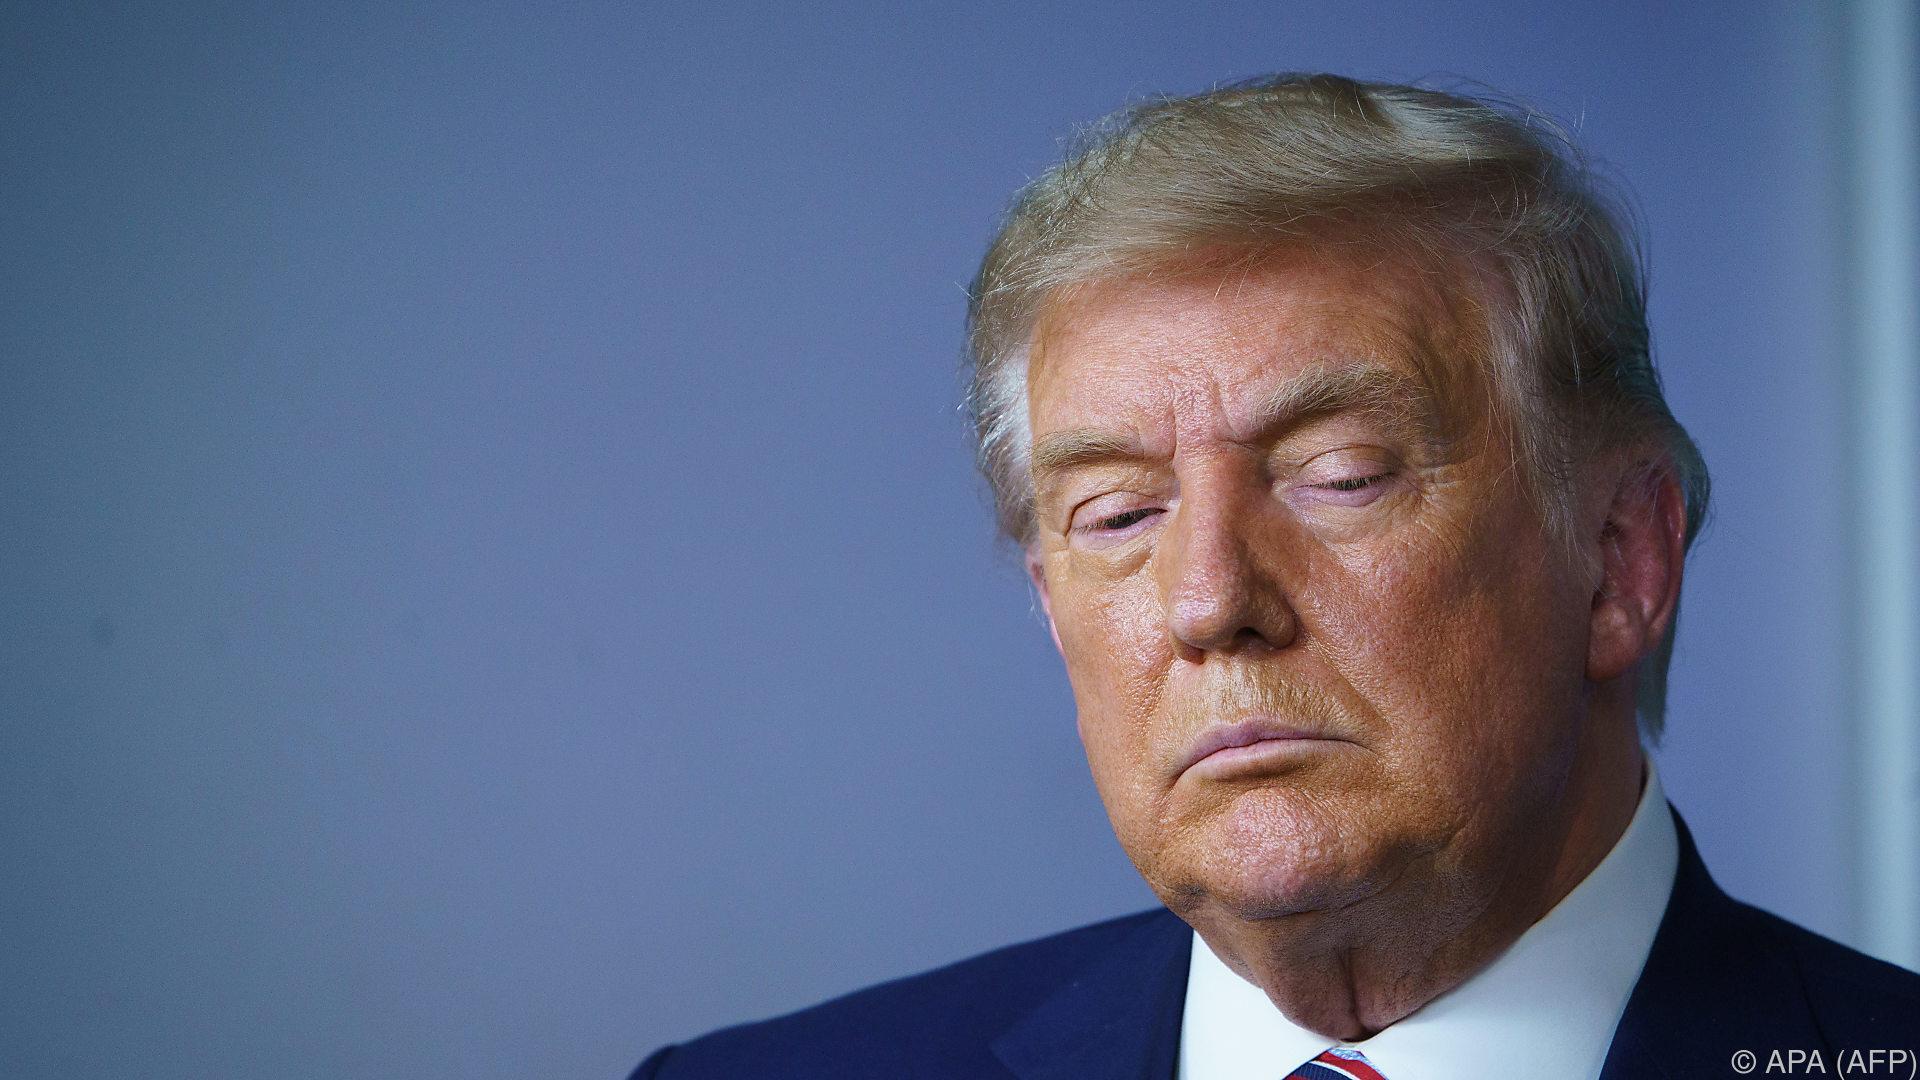 Trump ordnet Abzug fast aller US-Soldaten aus Somalia an